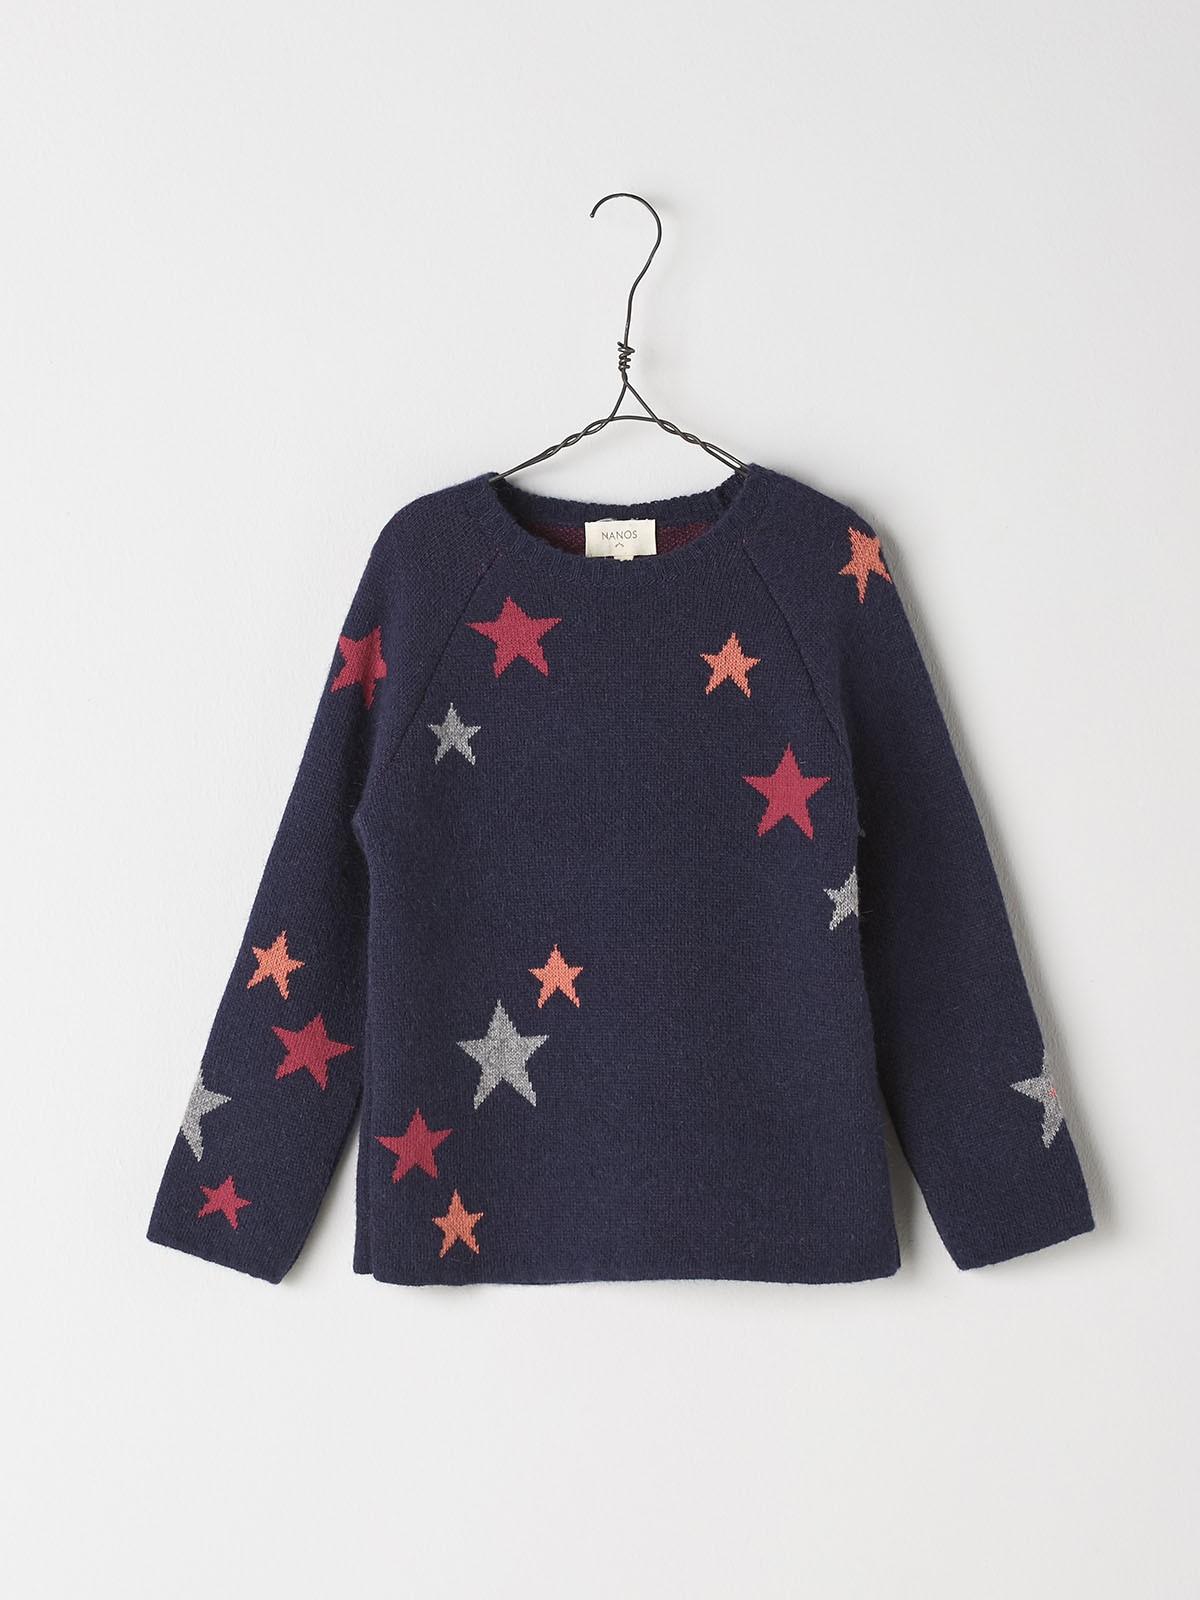 NANOS 黑色星星上衣